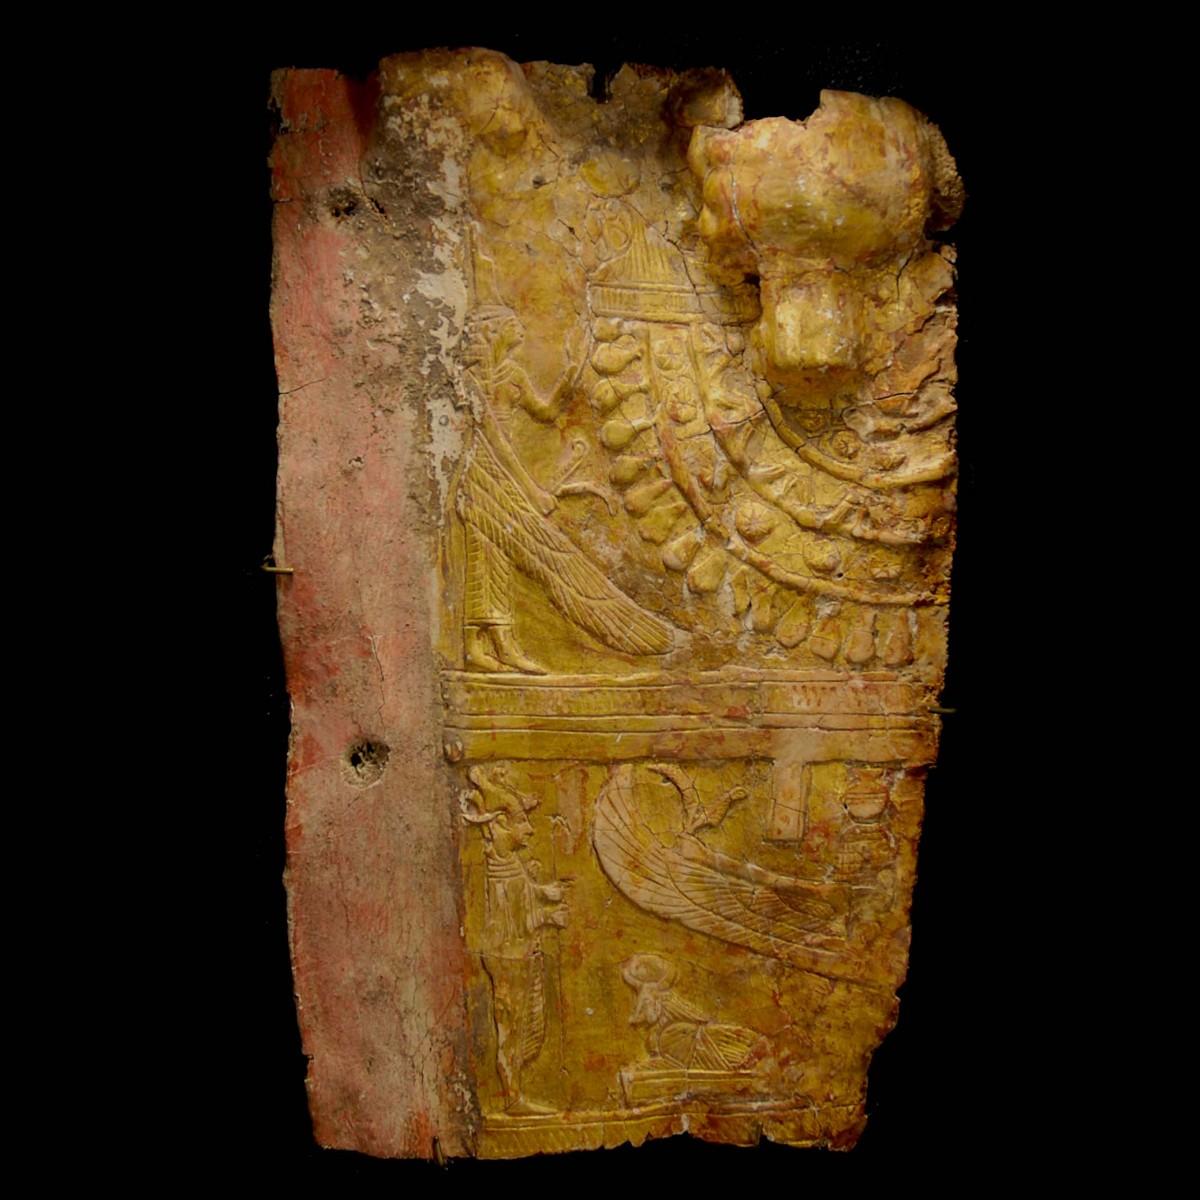 Egyptian gilded mummy cartonnage